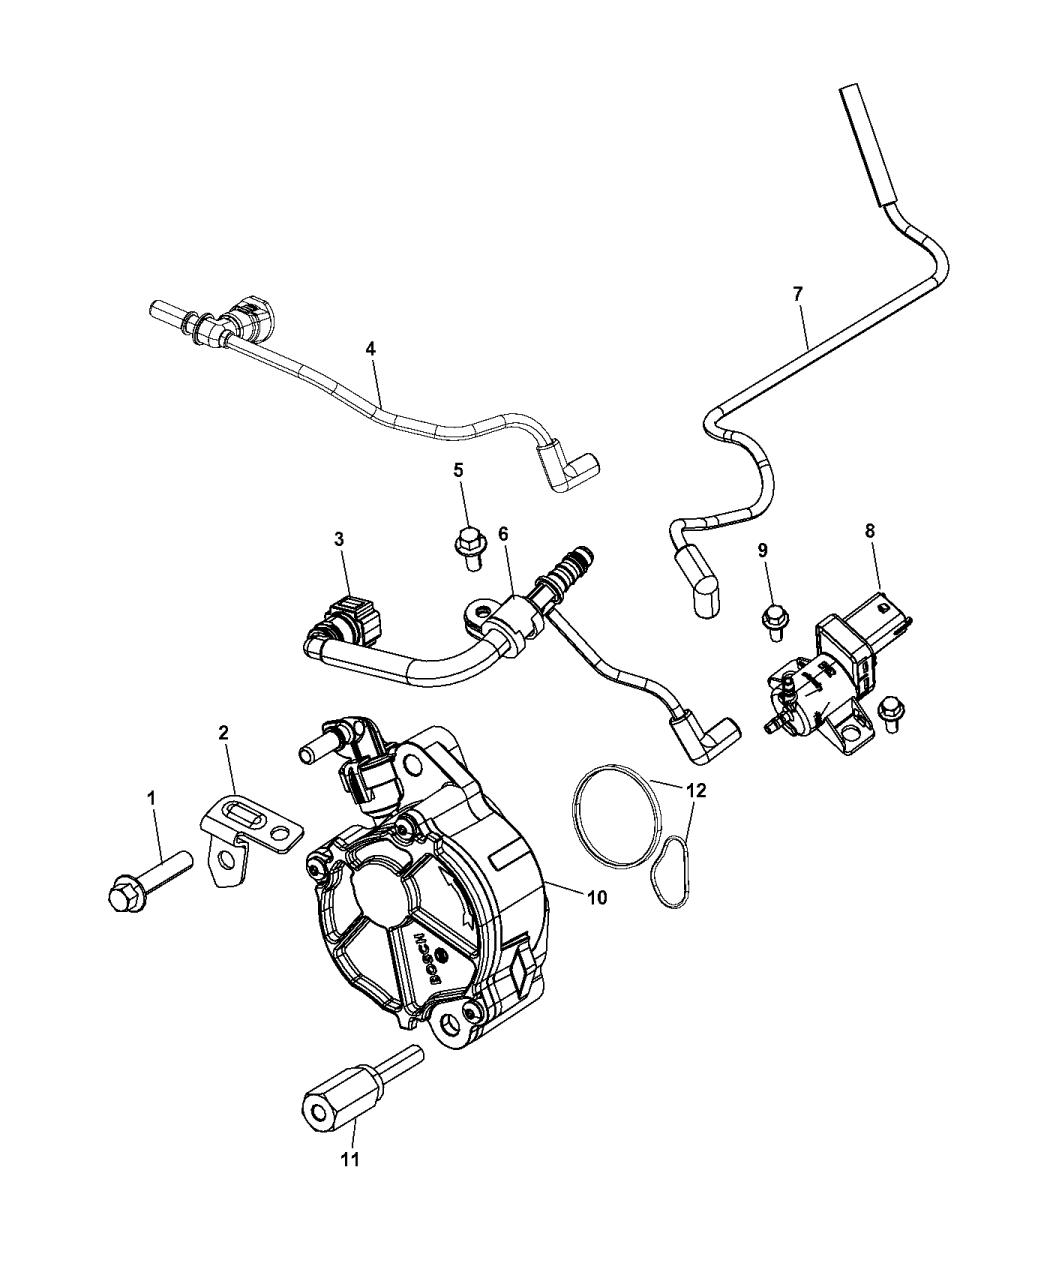 Sensational 2012 Jeep Grand Cherokee Vacuum Pump Vacuum Harness Wiring 101 Ouplipimpapsstreekradiomeanderfmnl